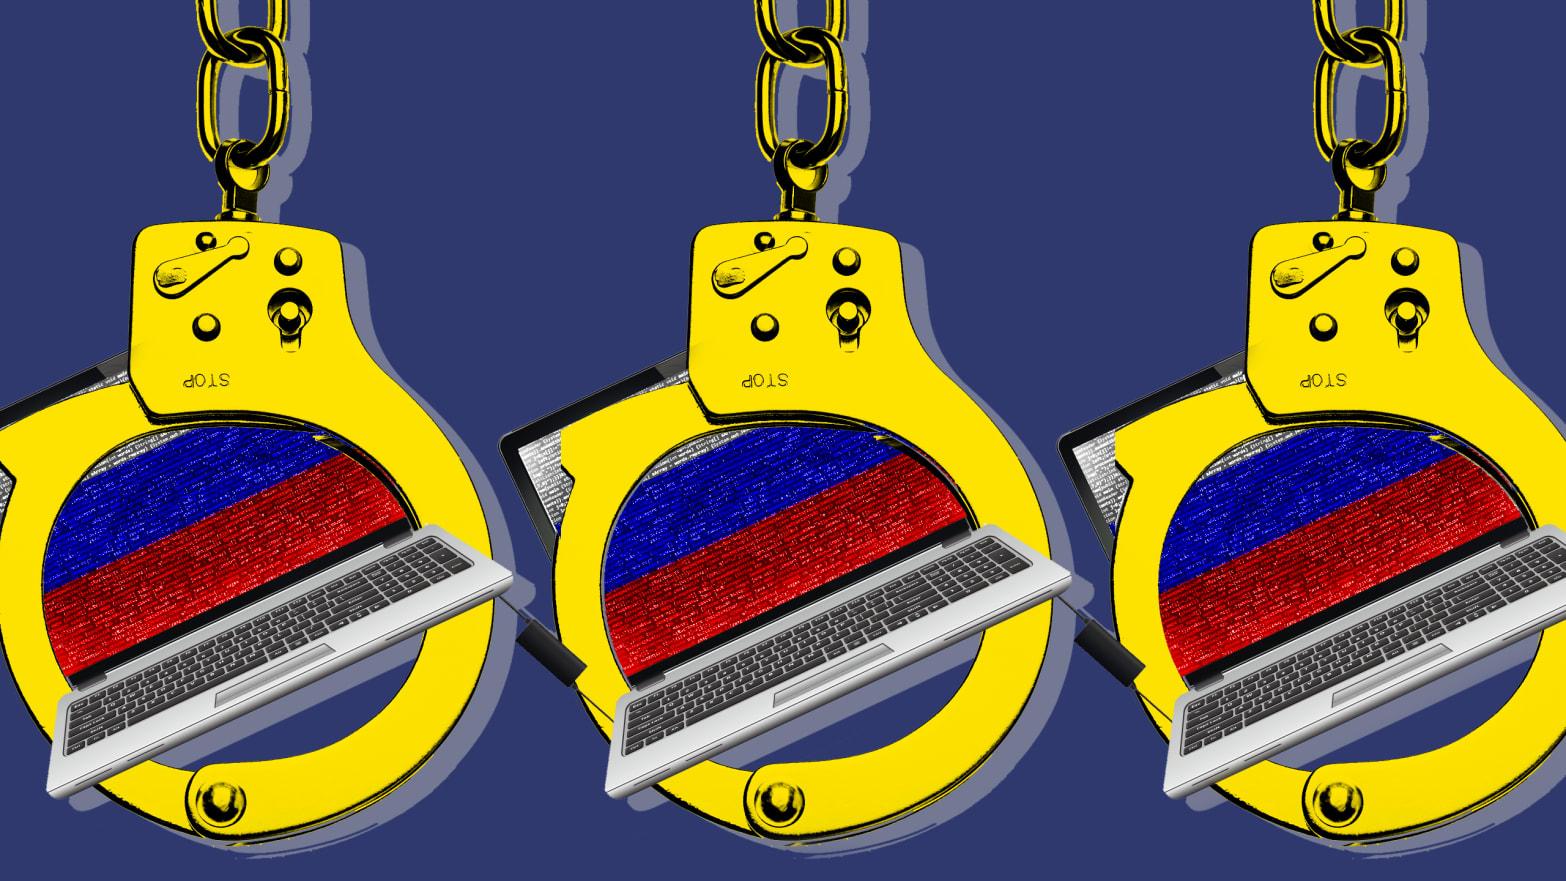 Exclusive: FBI Seizes Control of Russian Botnet